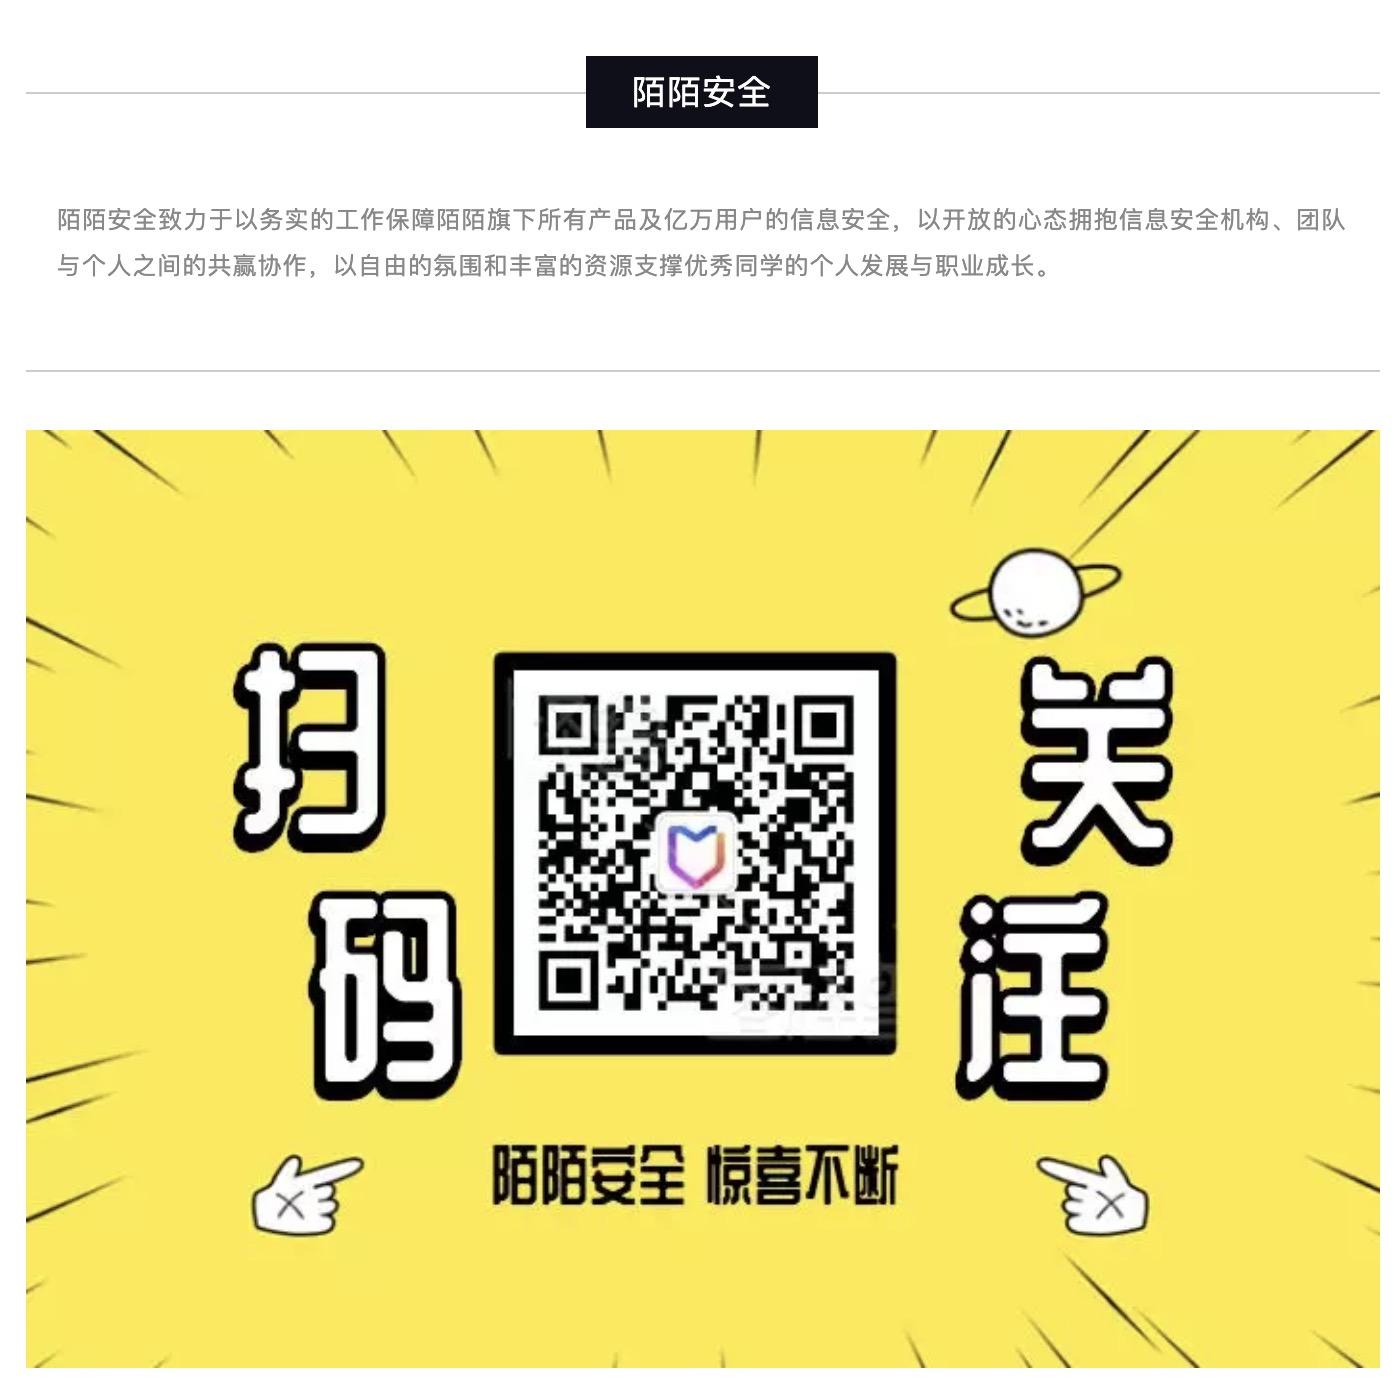 https://momo-mmsrc.oss-cn-hangzhou.aliyuncs.com/img-437a7dc7-b6e2-3602-9376-1bcebf44ffac.jpeg